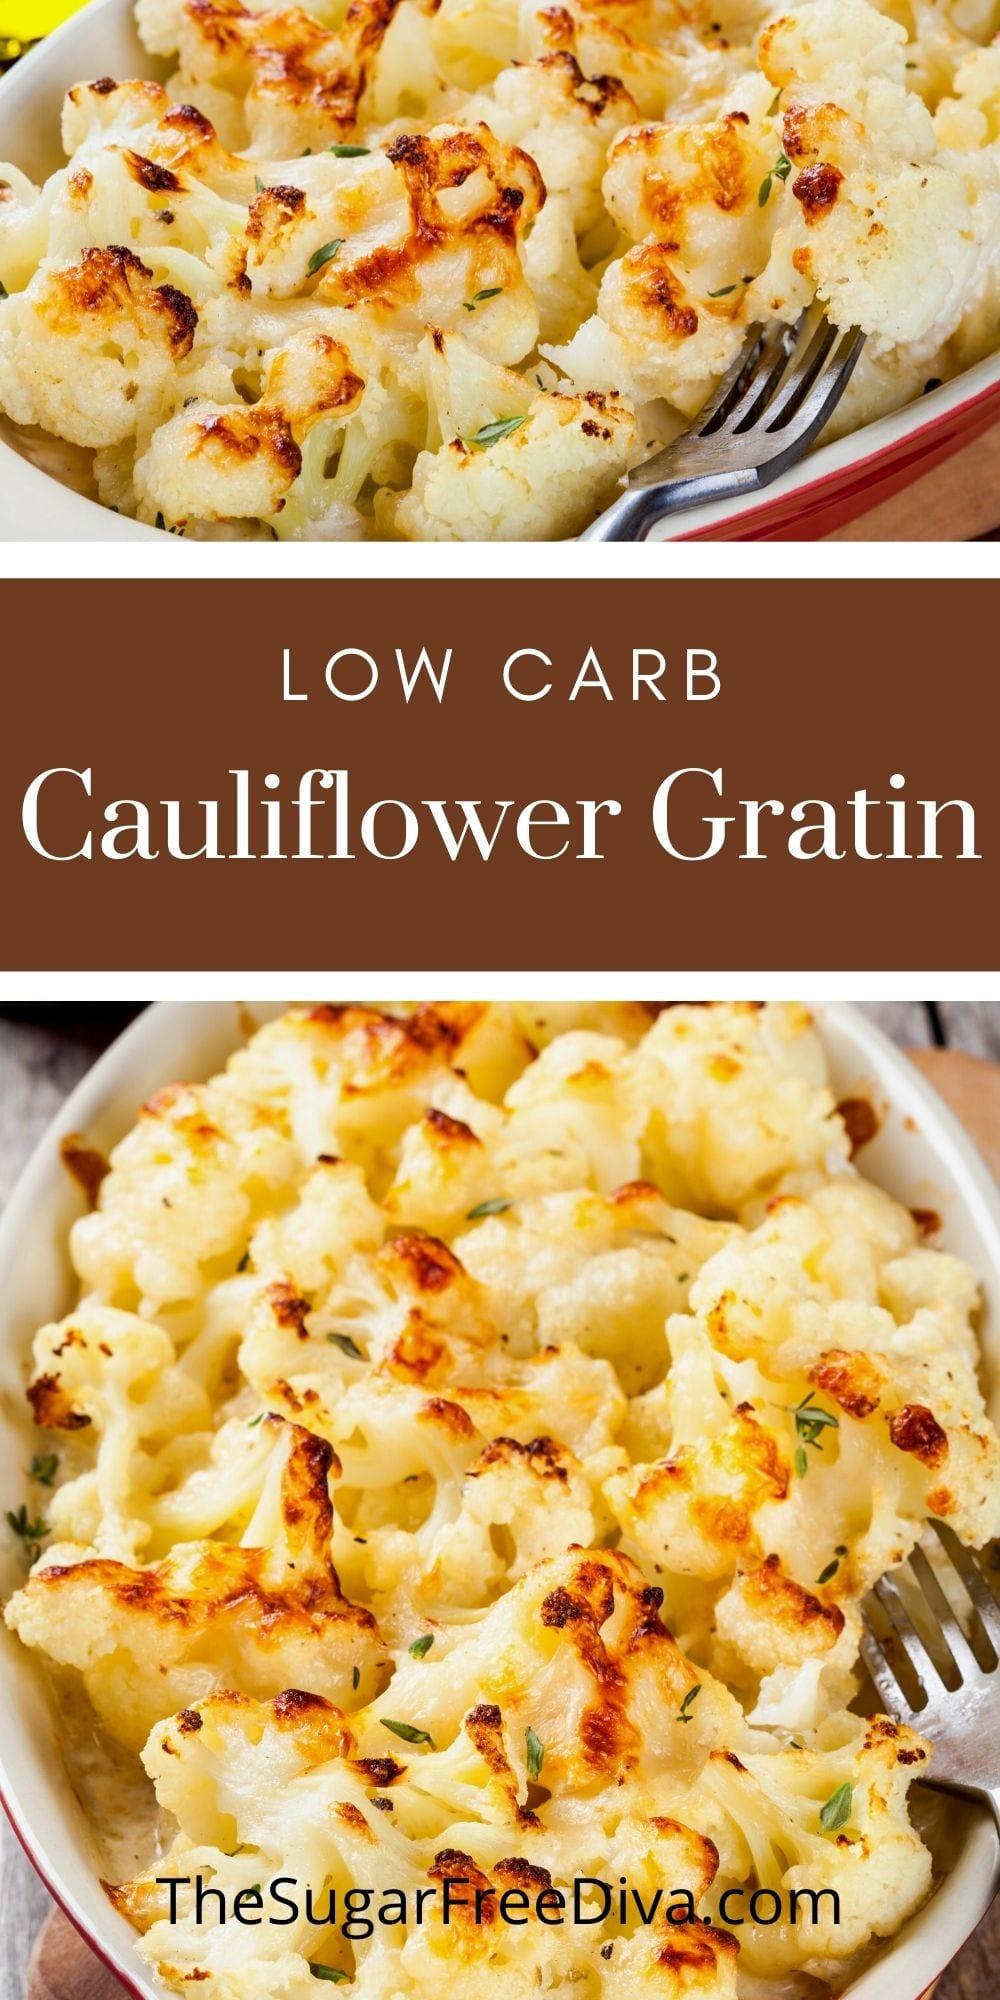 Low Carb Cauliflower Gratin